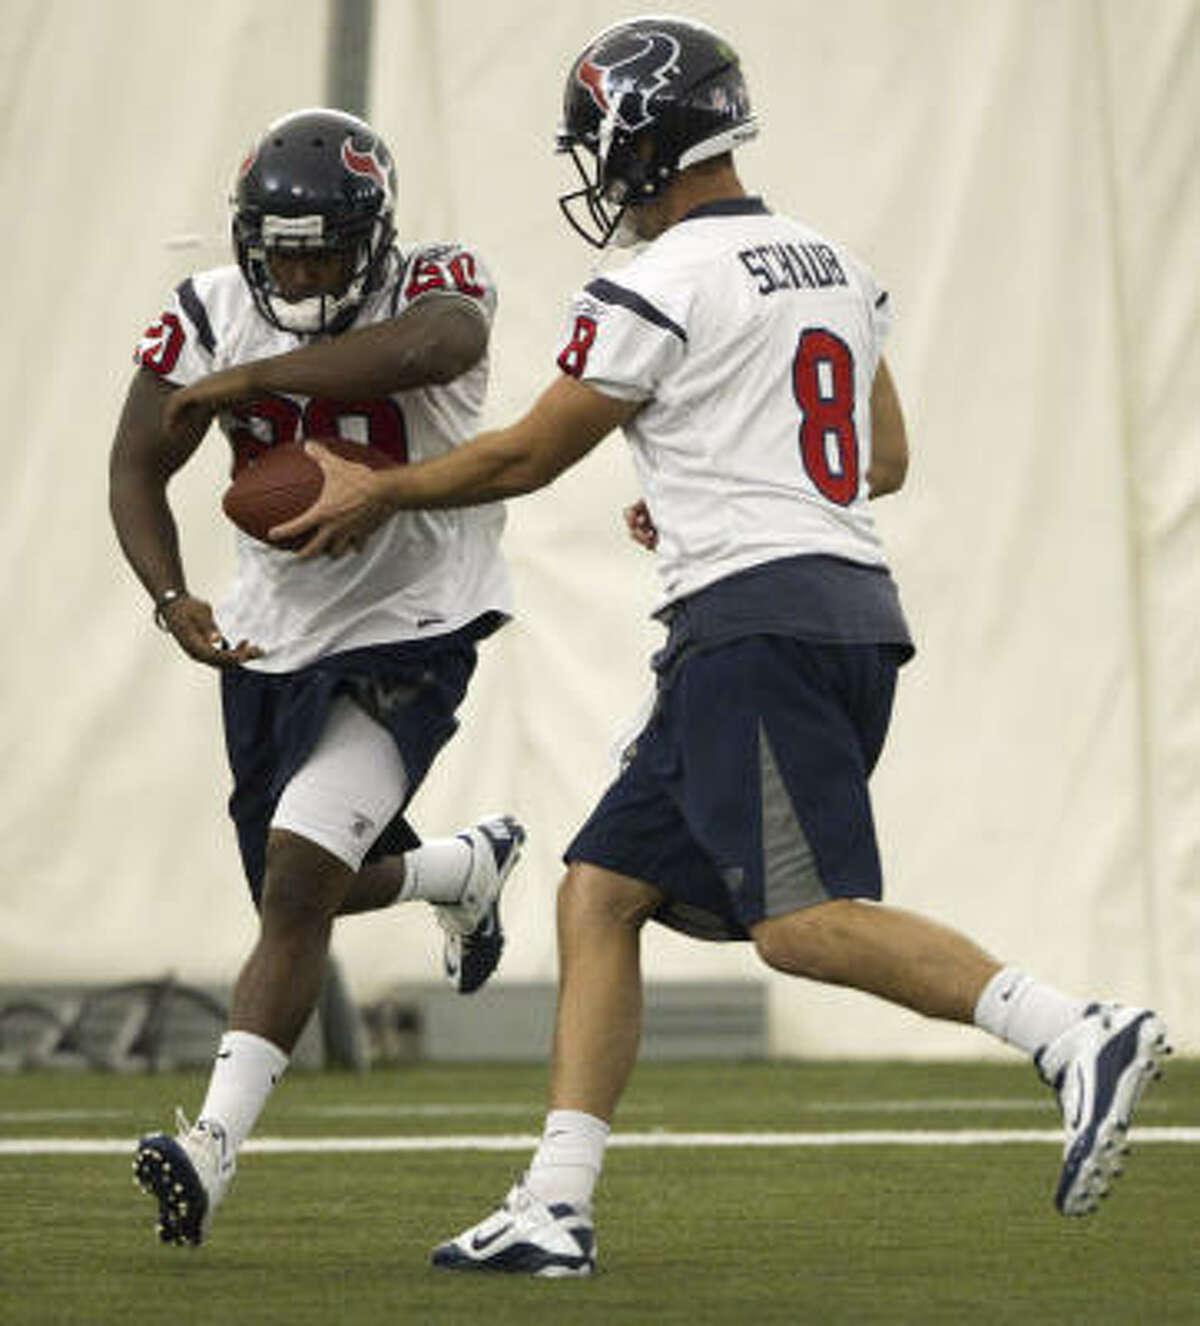 Texans running back Steve Slaton takes a handoff from quarterback Matt Schaub.